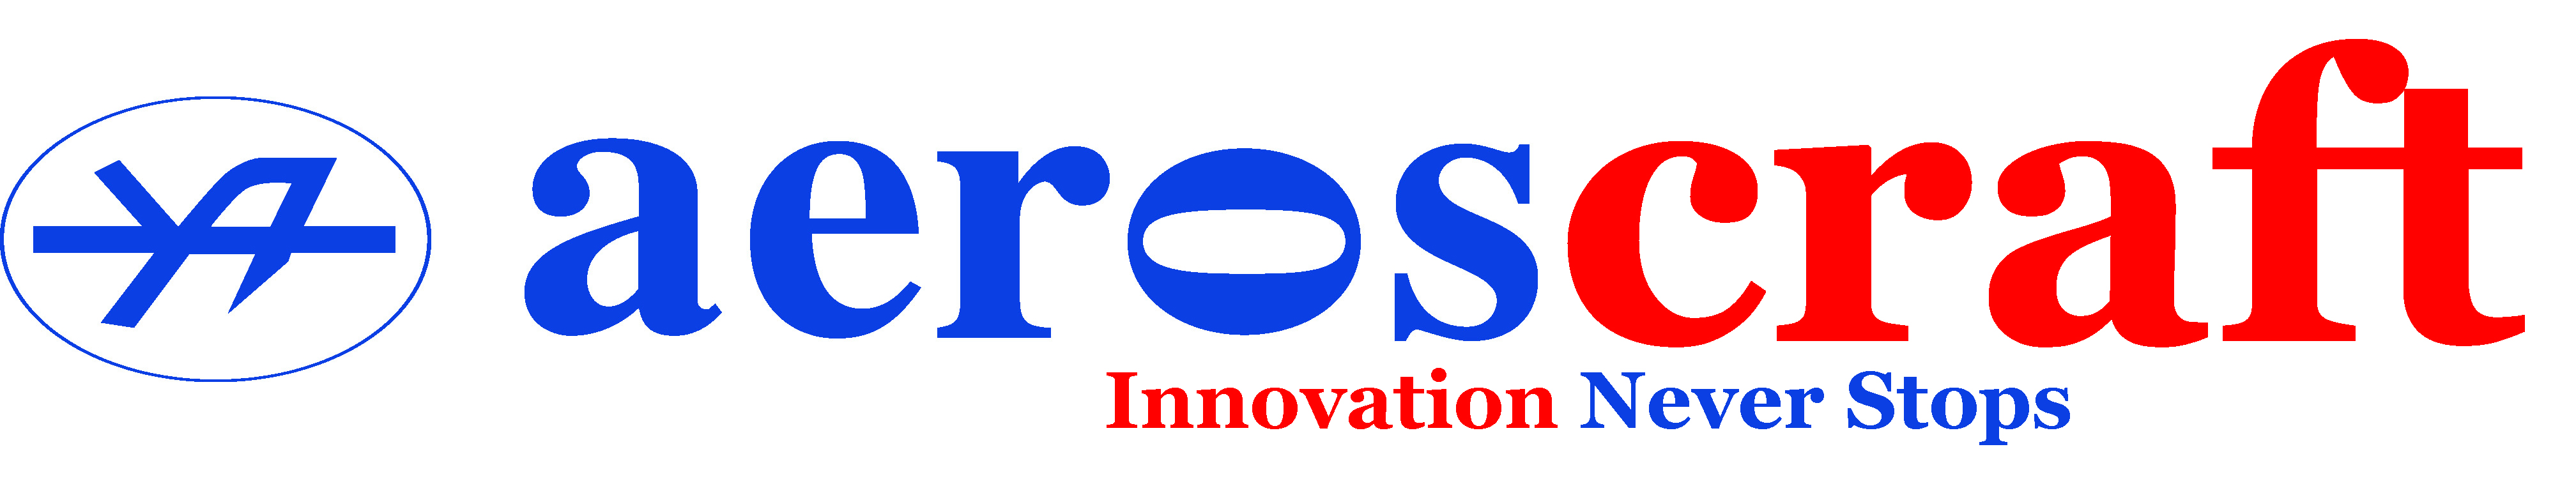 made-in-california-worldwide-aeros-logo.jpg